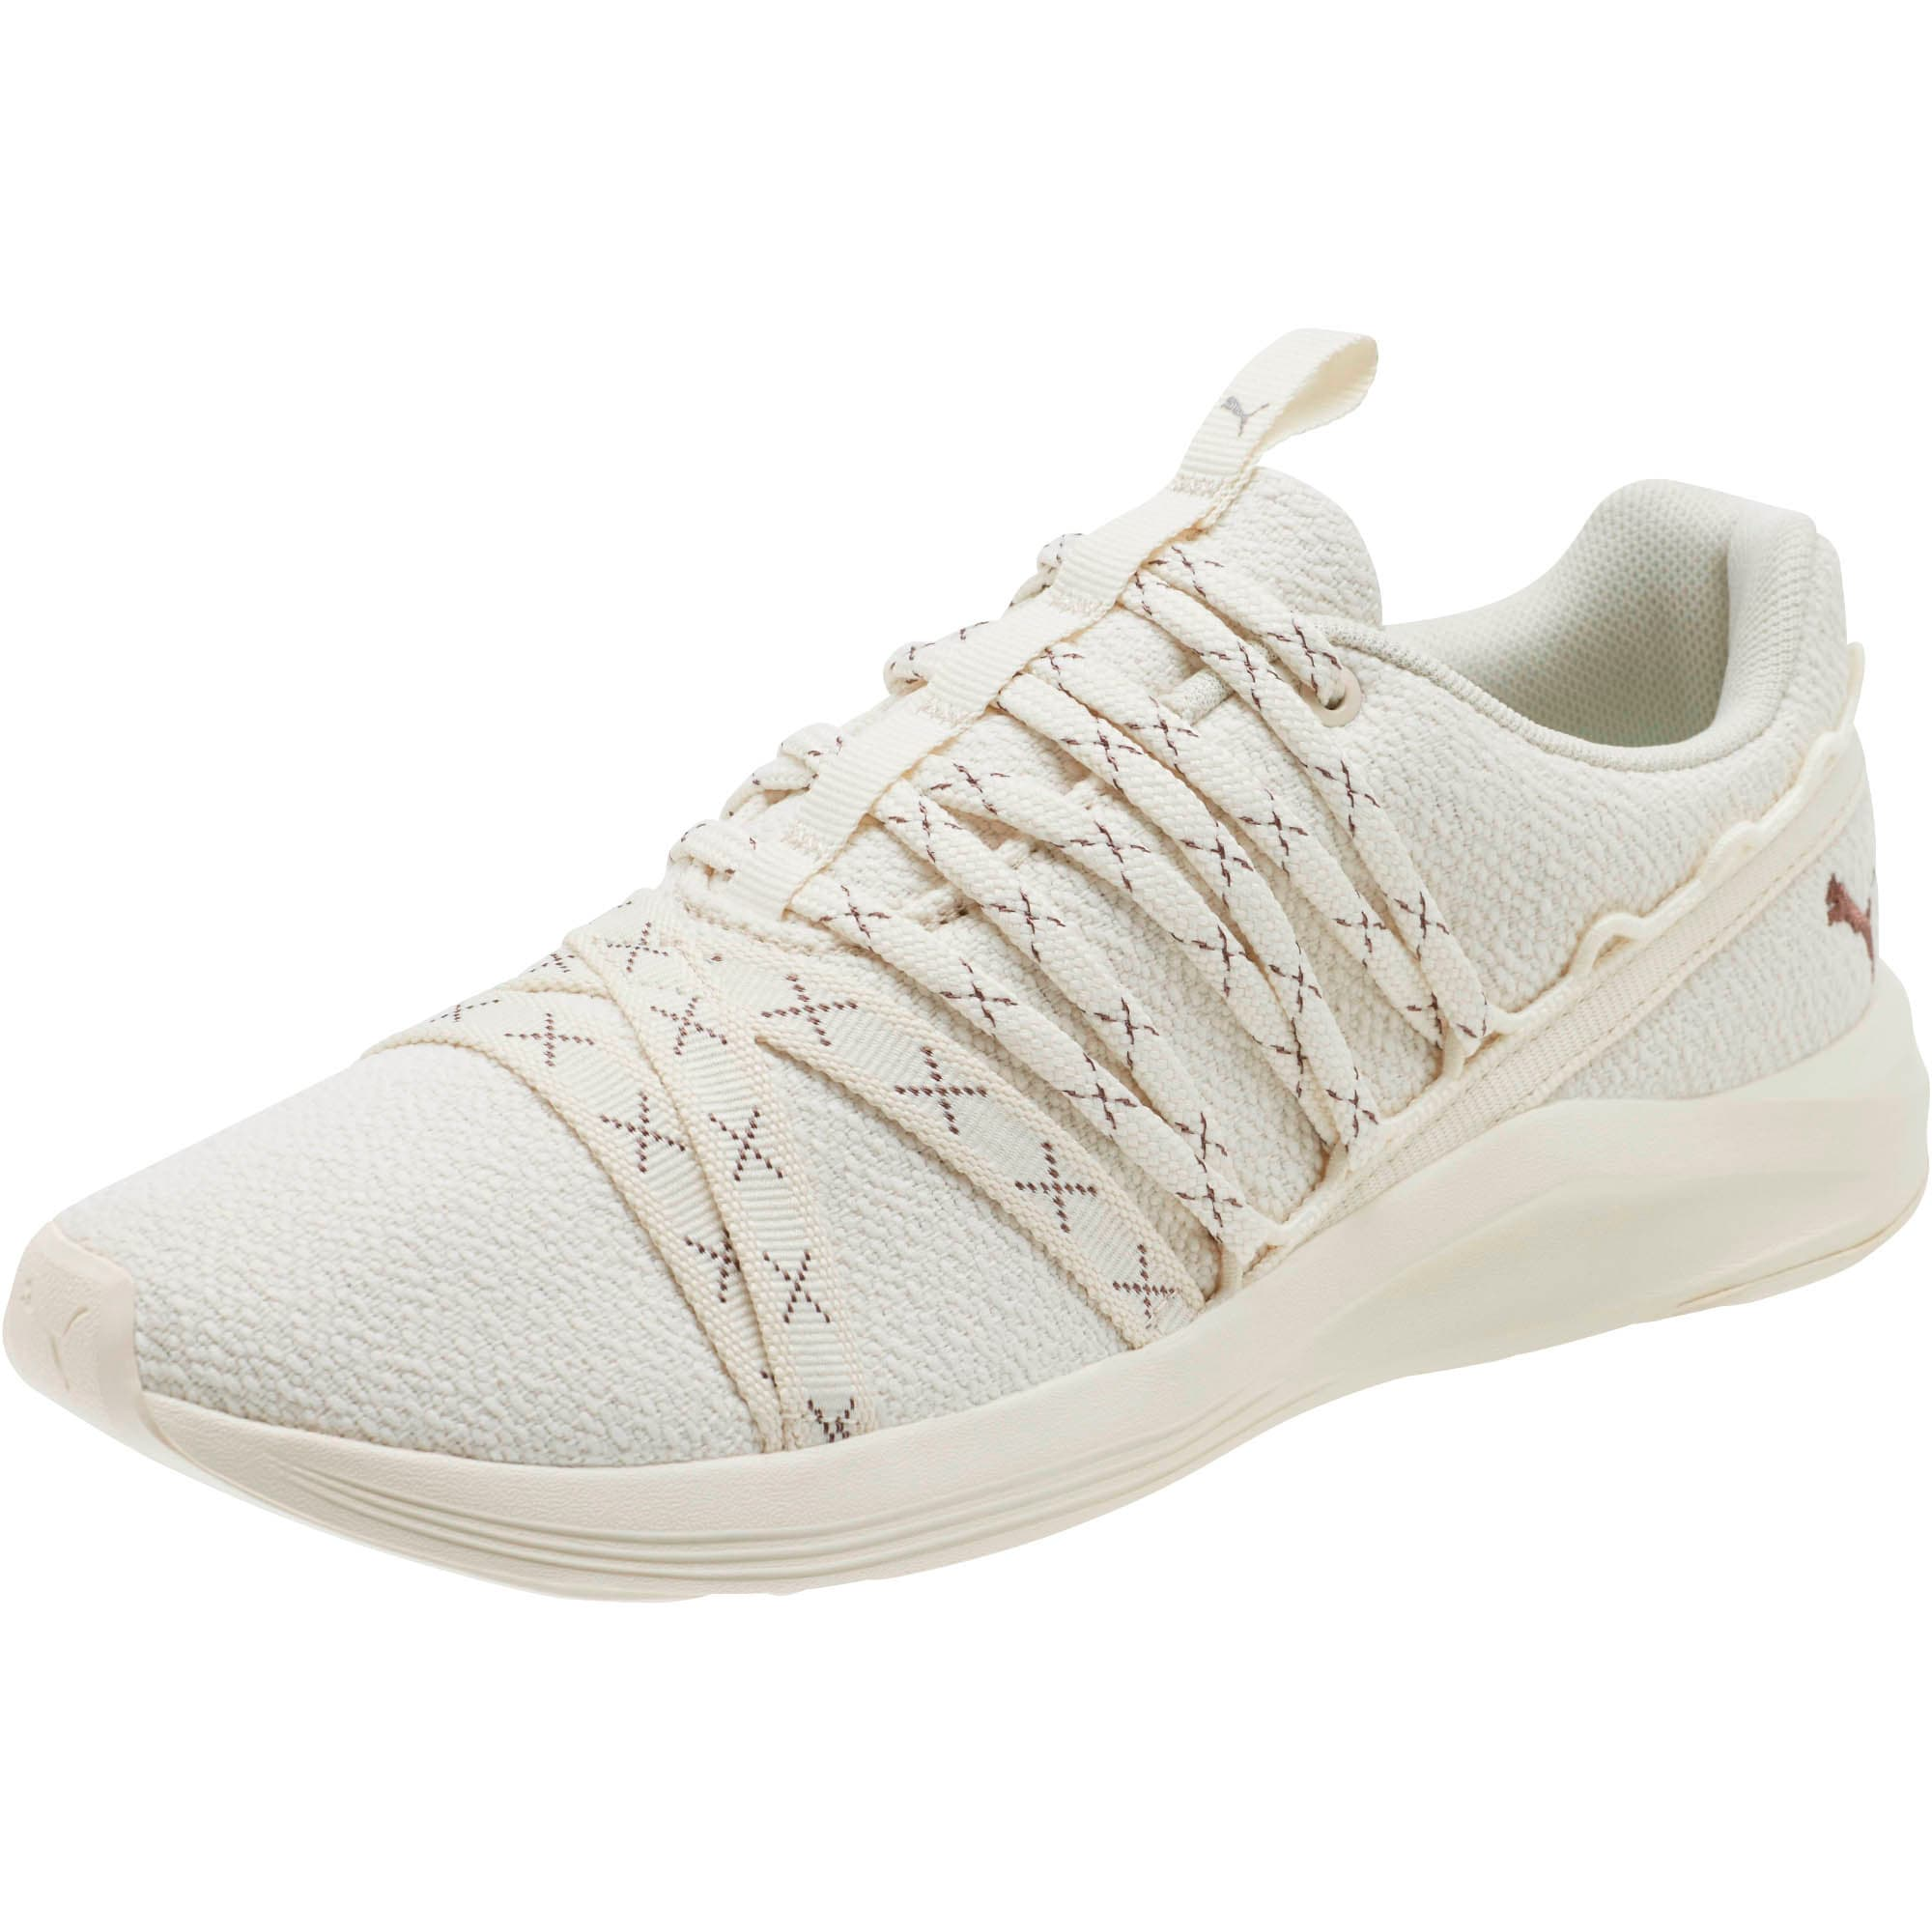 Thumbnail 1 of Prowl Alt 2 LX Women's Training Shoes, Whisper White, medium